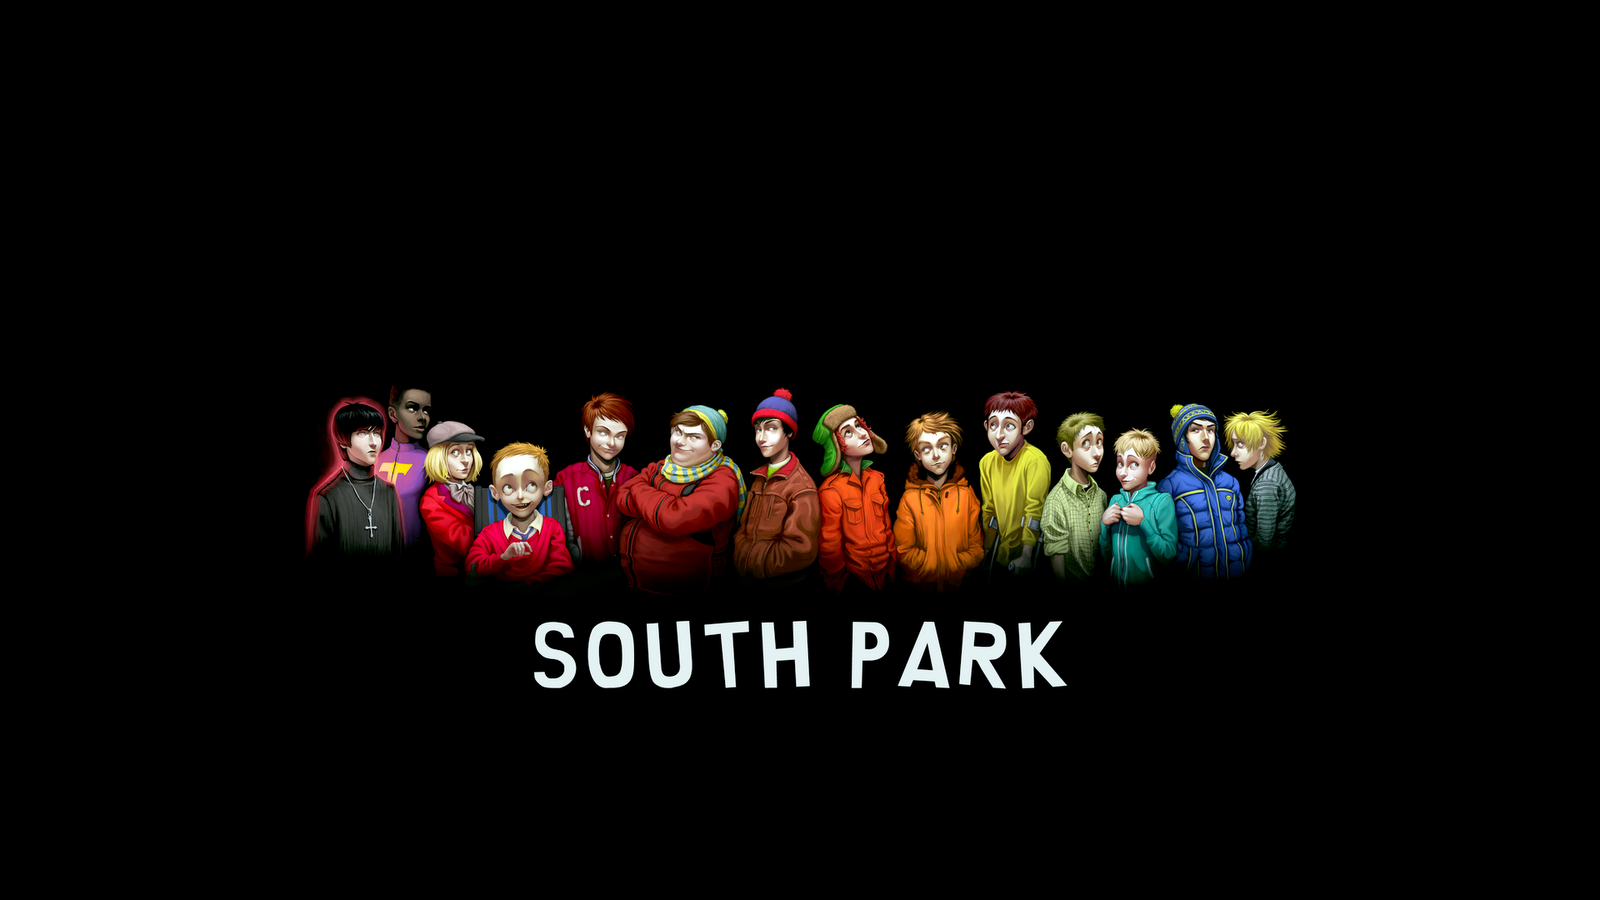 http://1.bp.blogspot.com/-HS4-zQa_rBU/T0-5mjXaurI/AAAAAAAAAn8/VseO83MAJxU/s1600/South+park+wallpaper.png